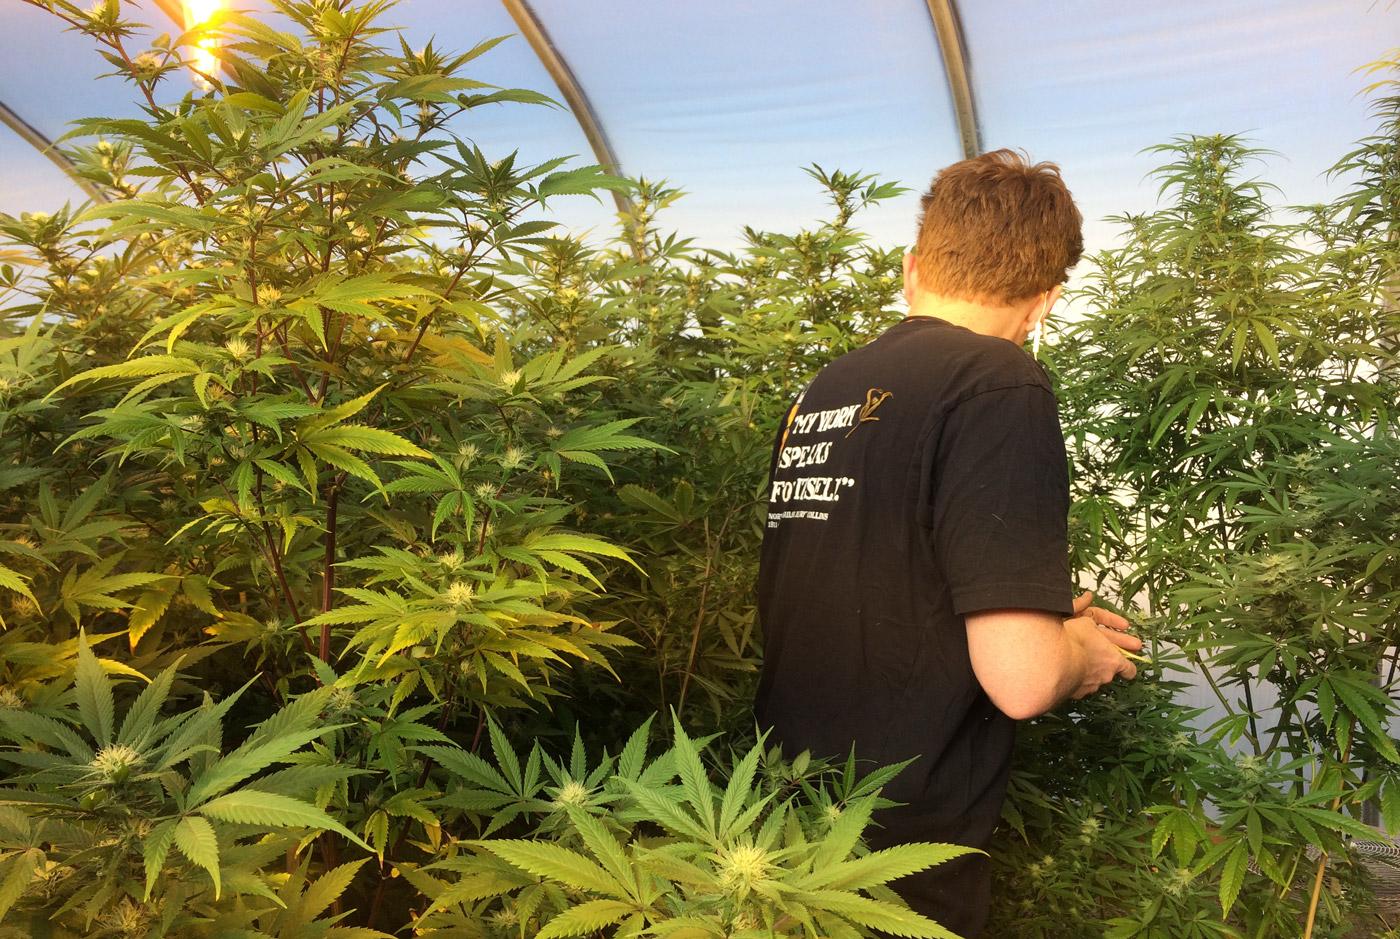 http://mashable.com/2014/12/31/marijuana-farm-startup/